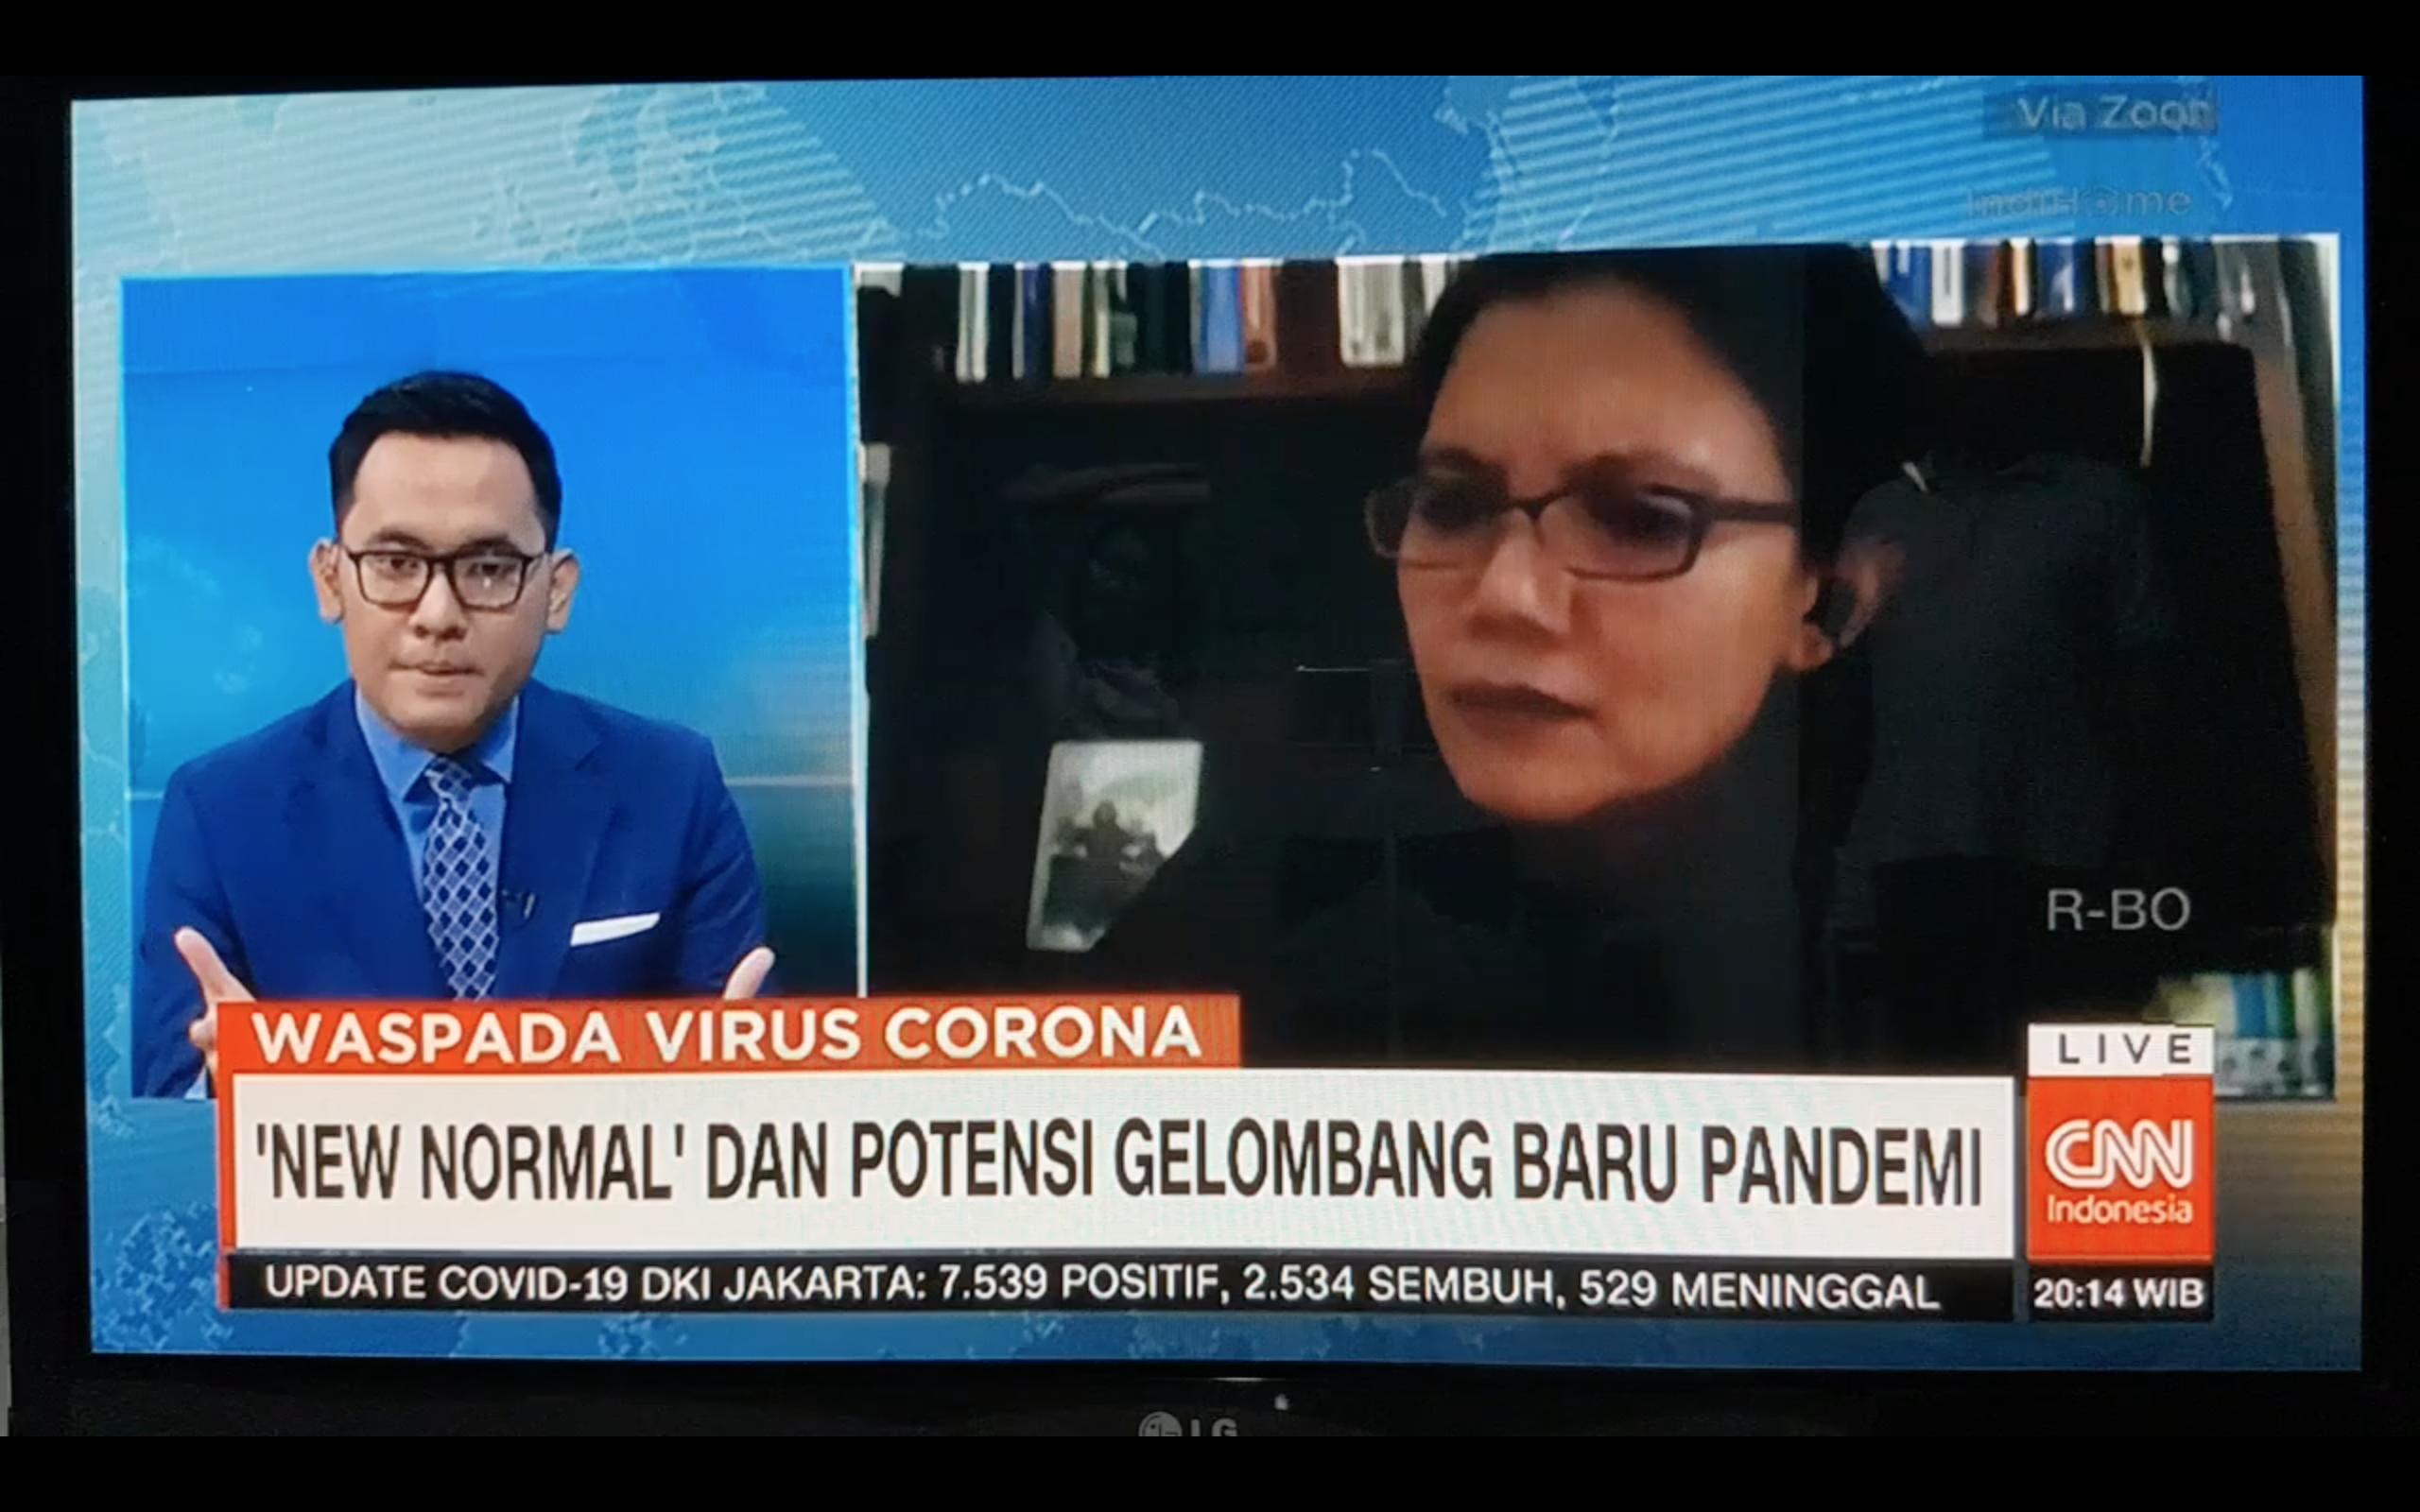 'New Normal' Pada Masa Pandemi Covid- 19 Menurut Dr. Mia Miranti